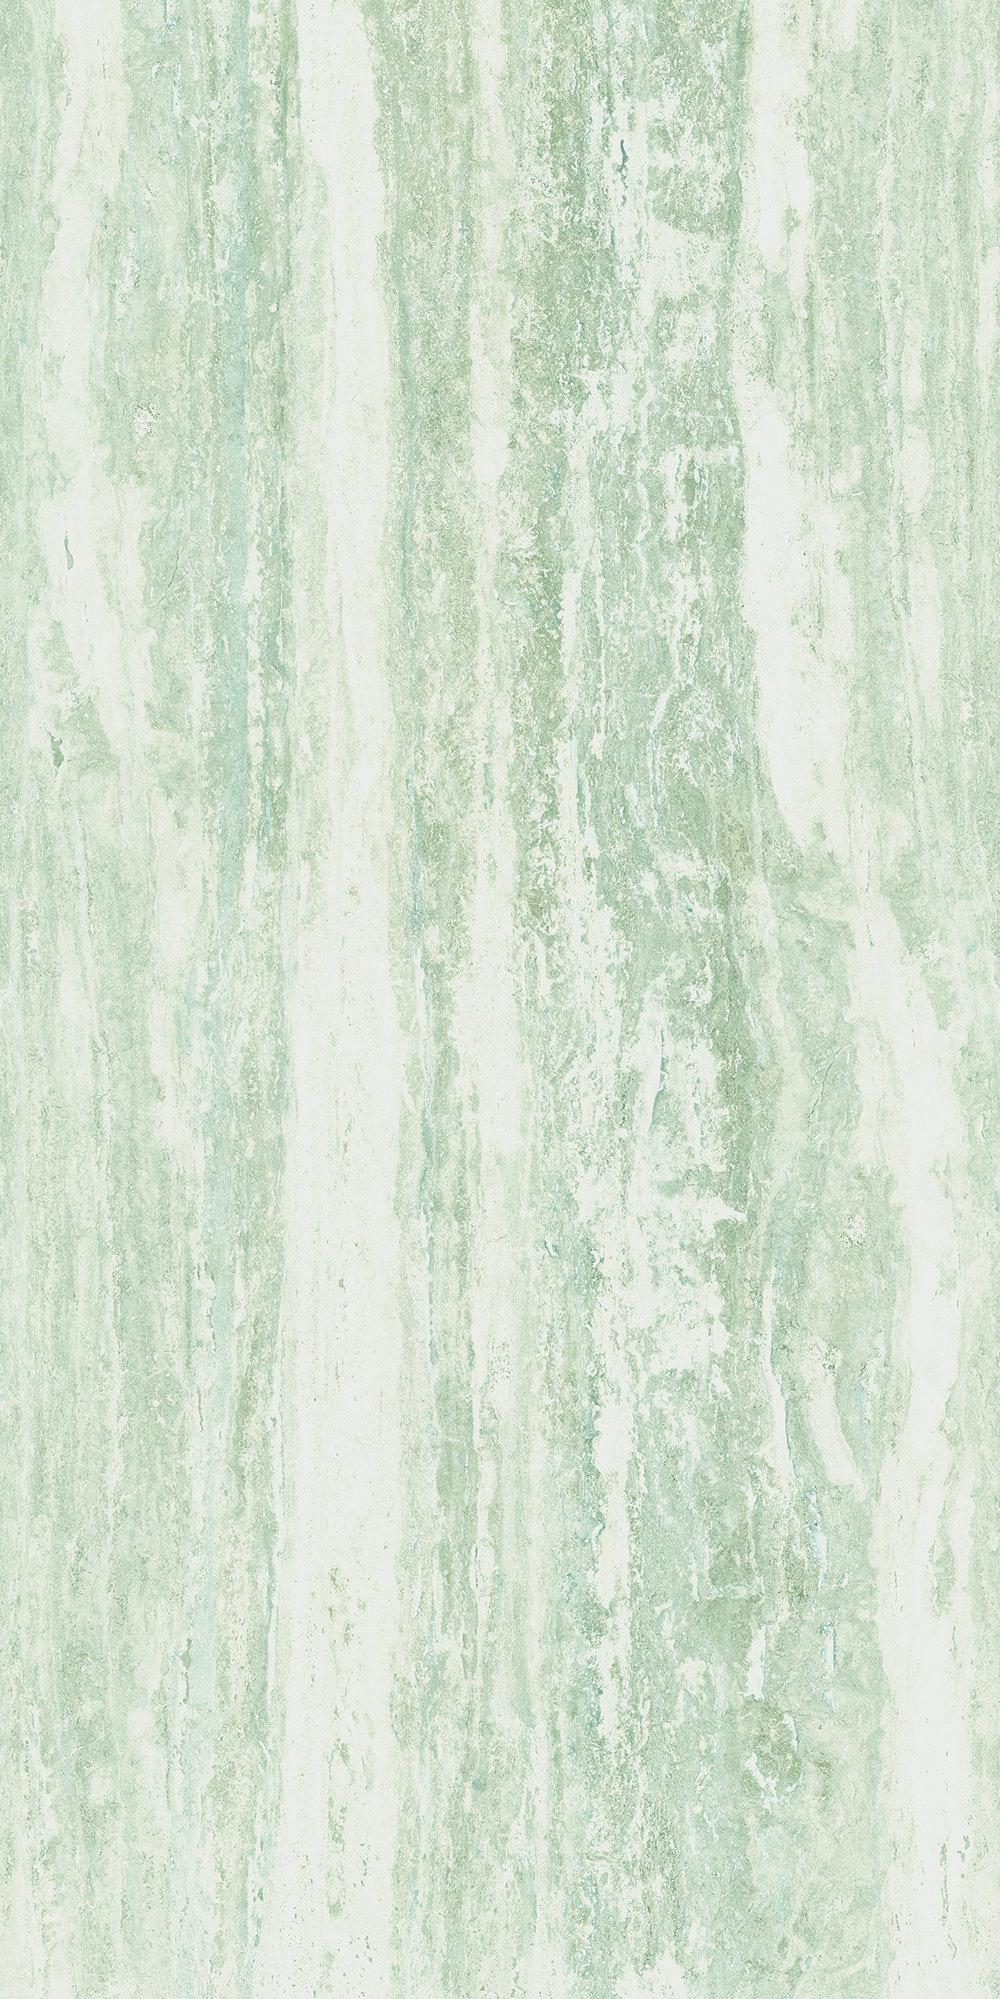 Bianco Travertine - Thin Porcelain